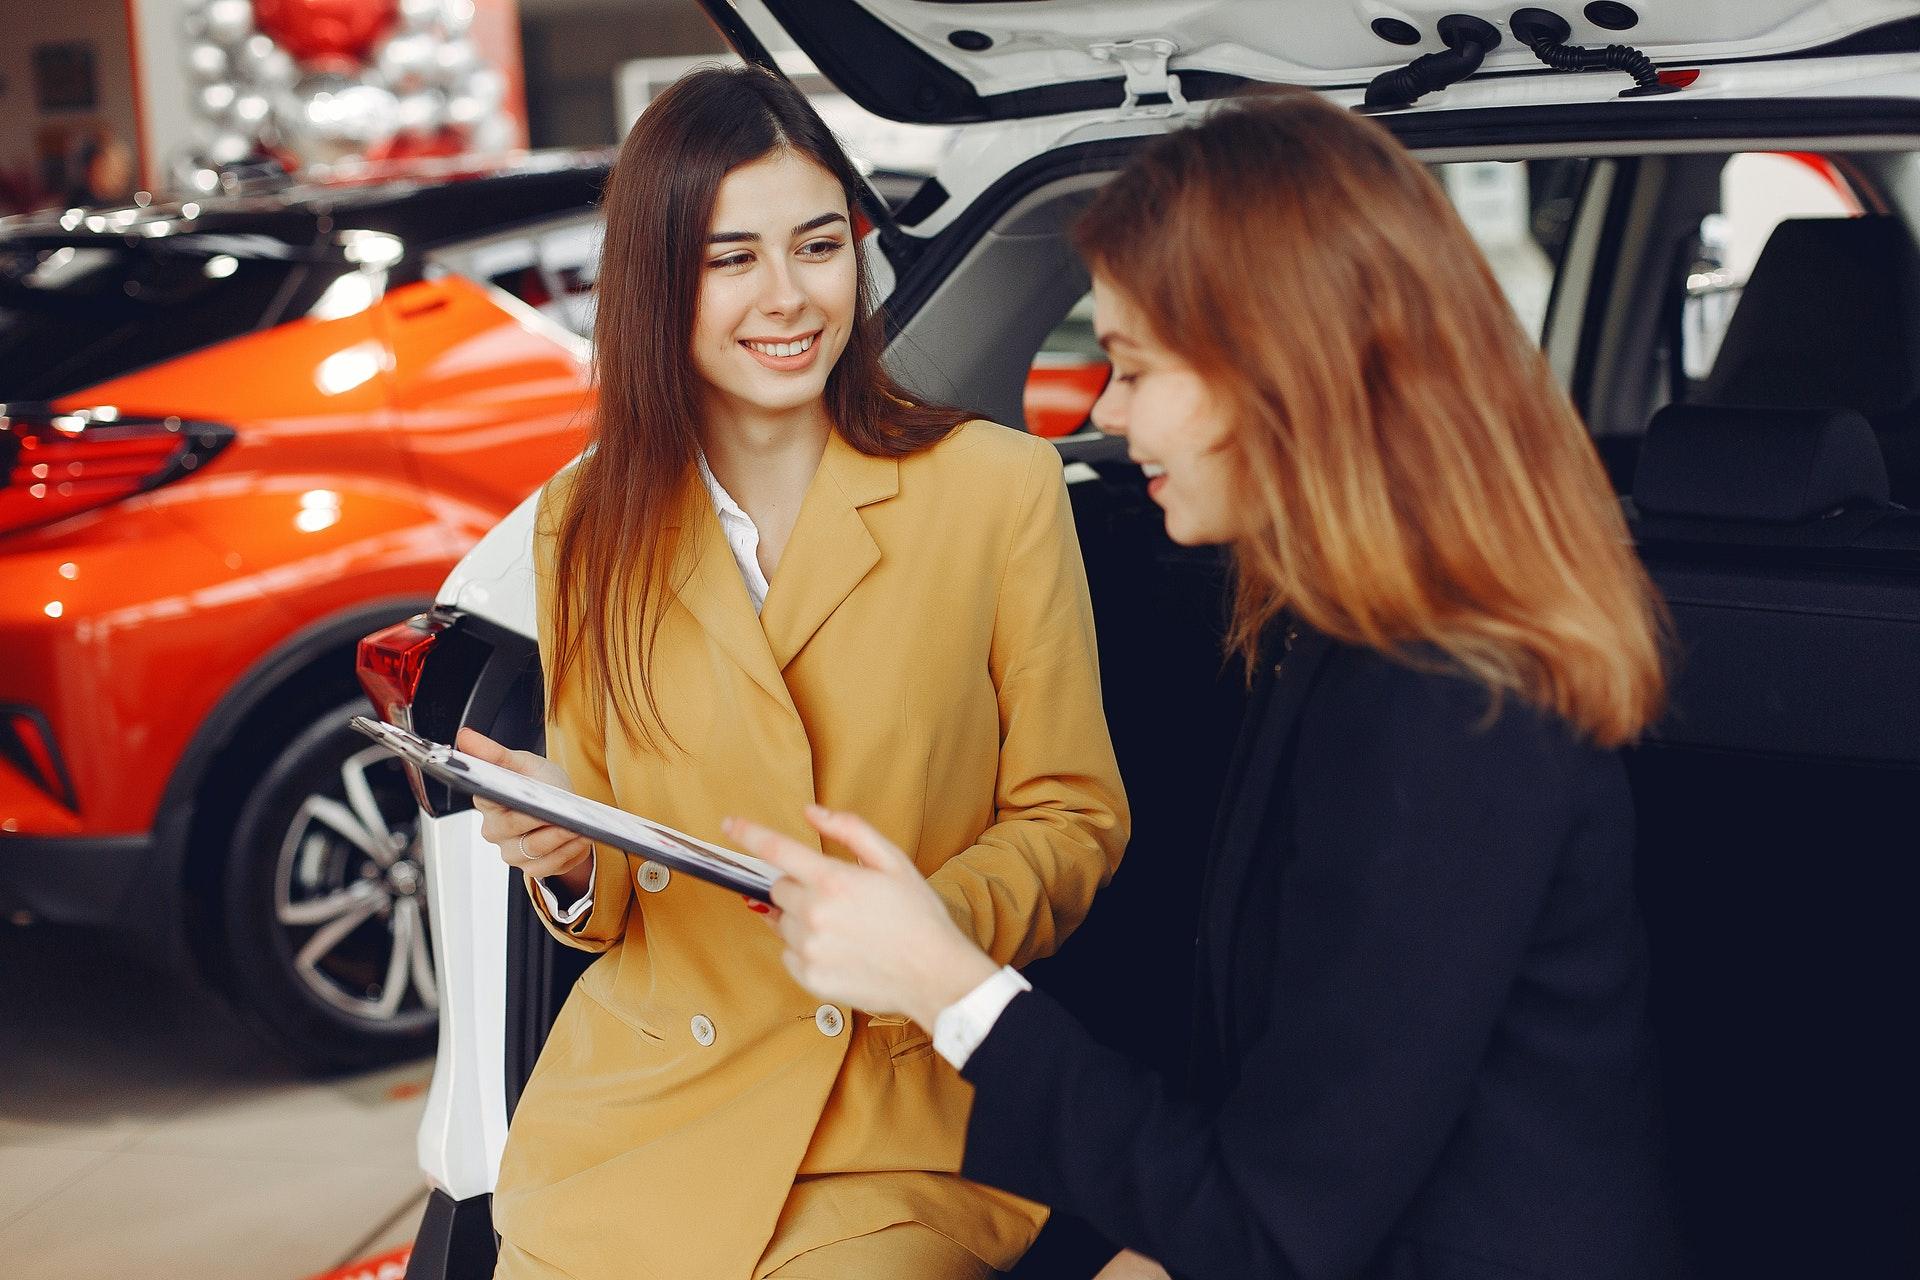 woman purchasing a car at a dealership